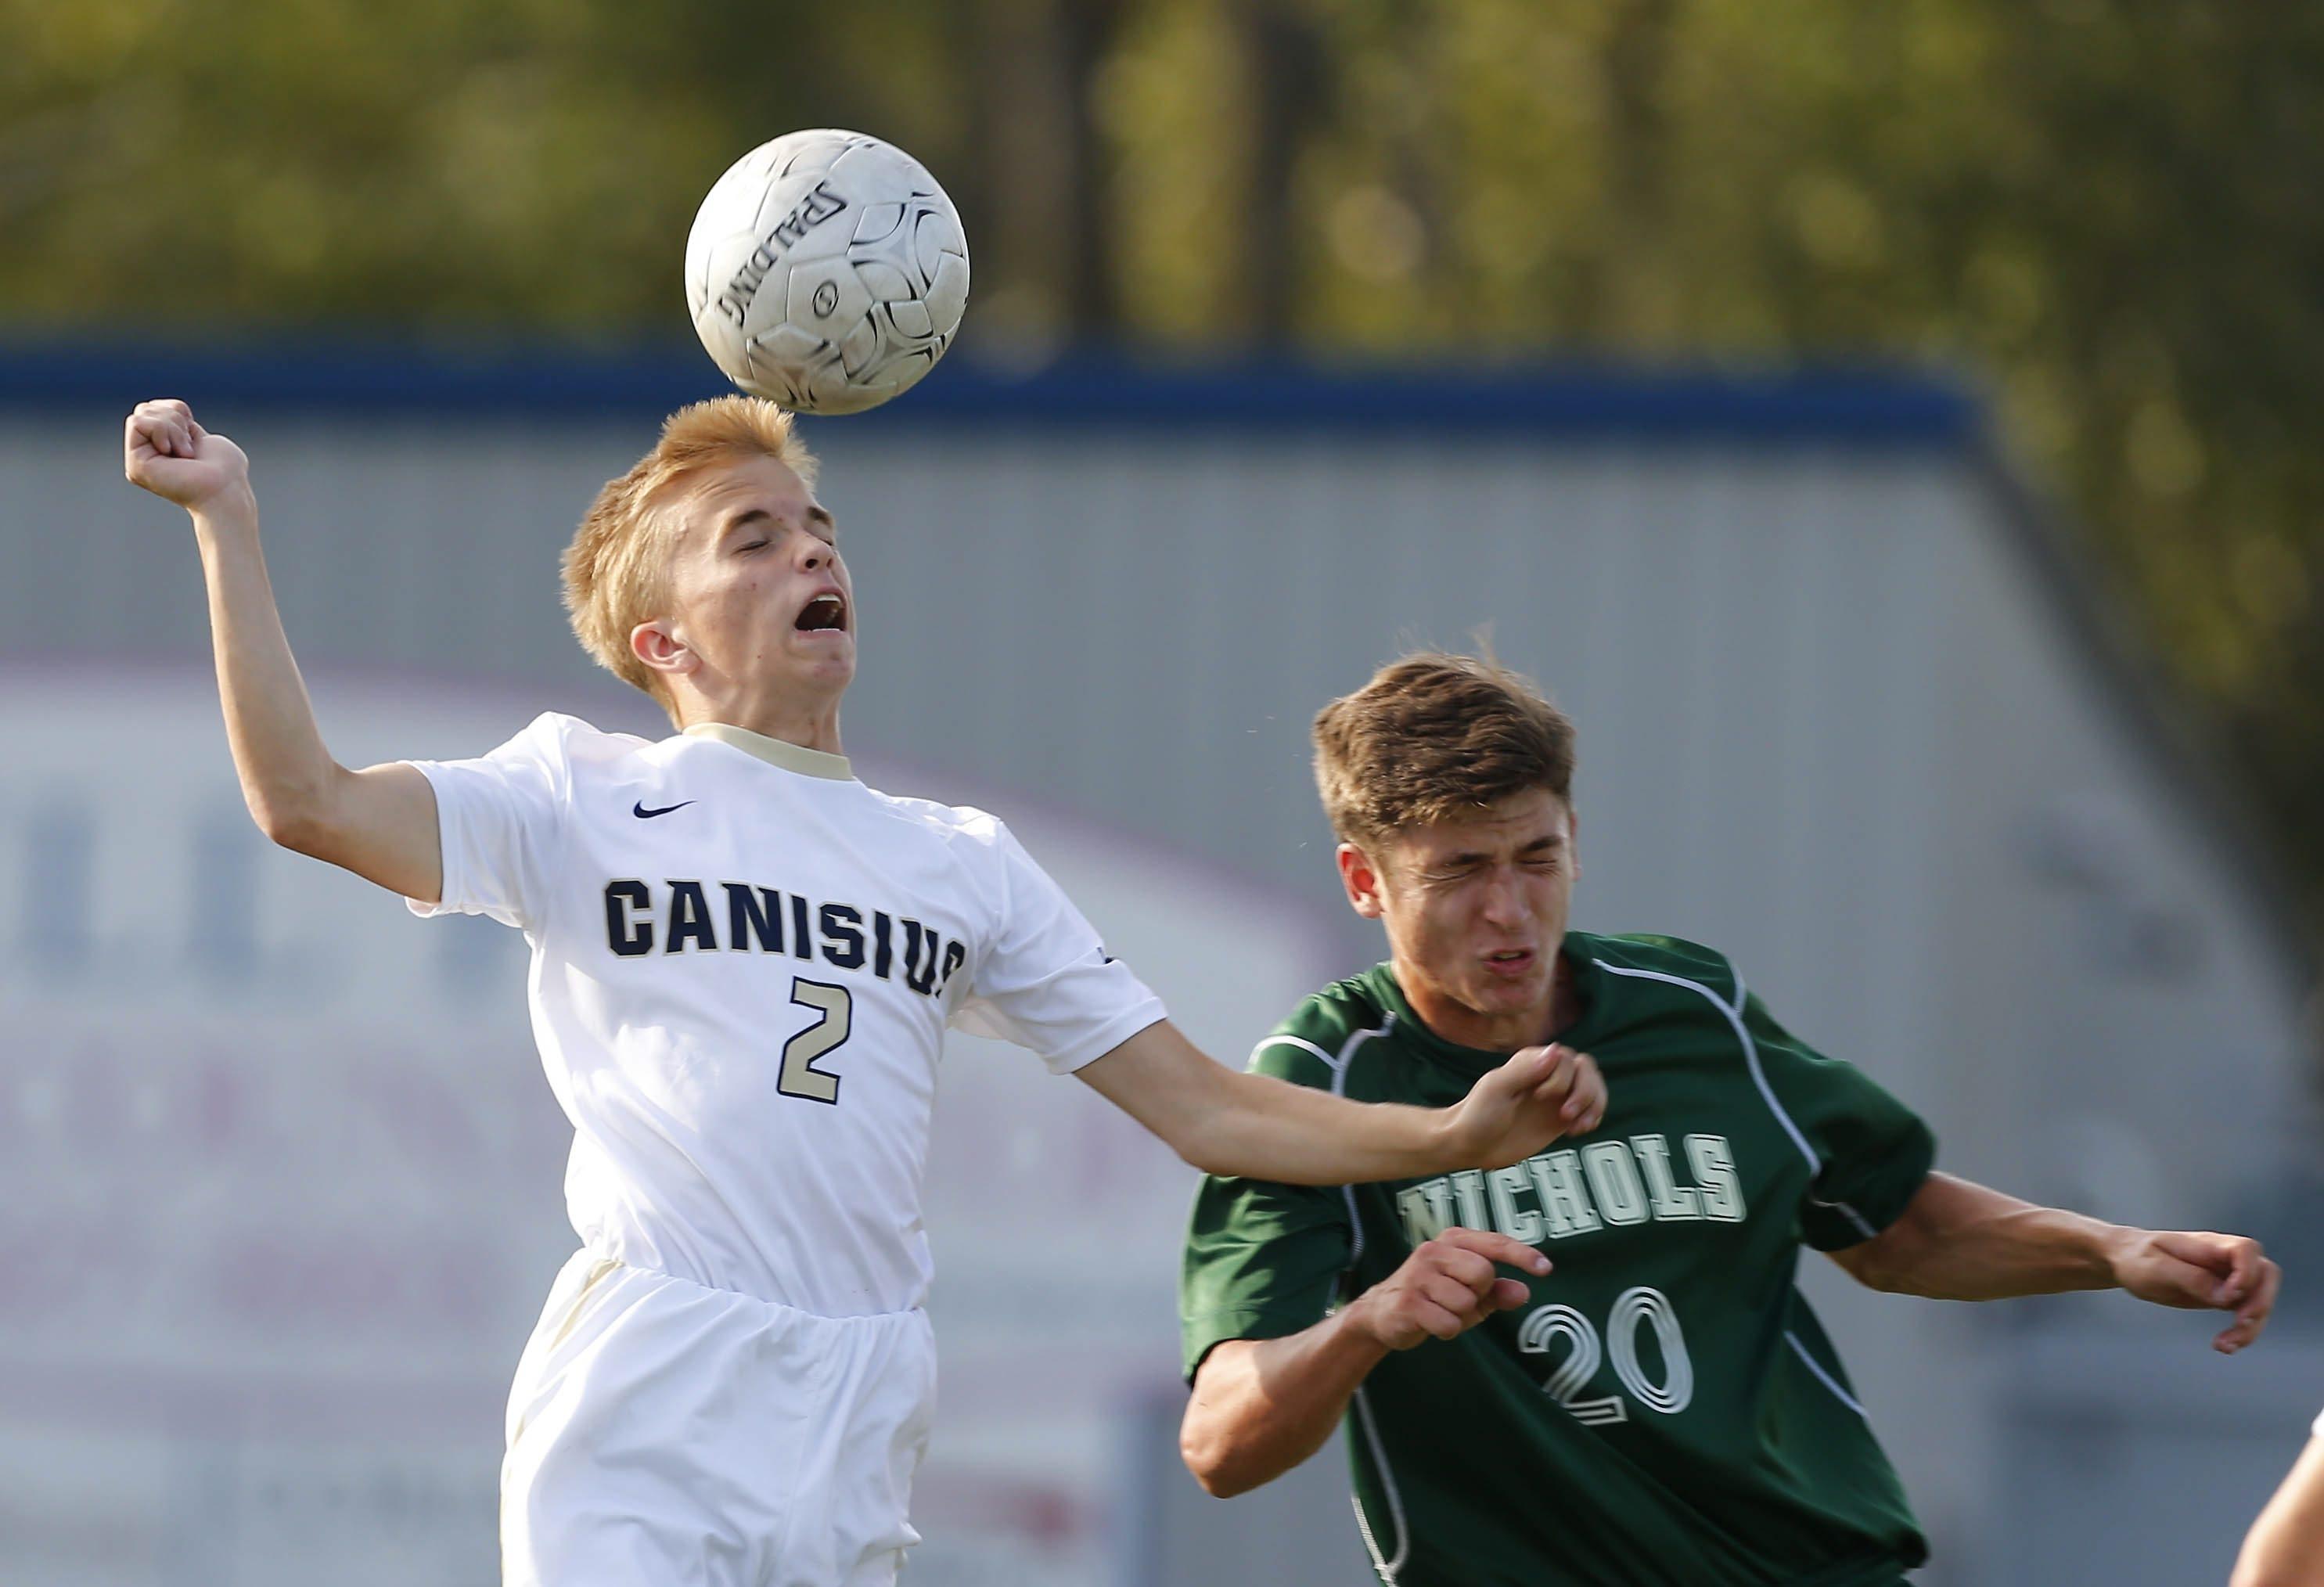 Canisius' Cameron Ciesielski heads the ball past Nichols' Matthew Calleri during Thursday's Monsignor Martin Association game.